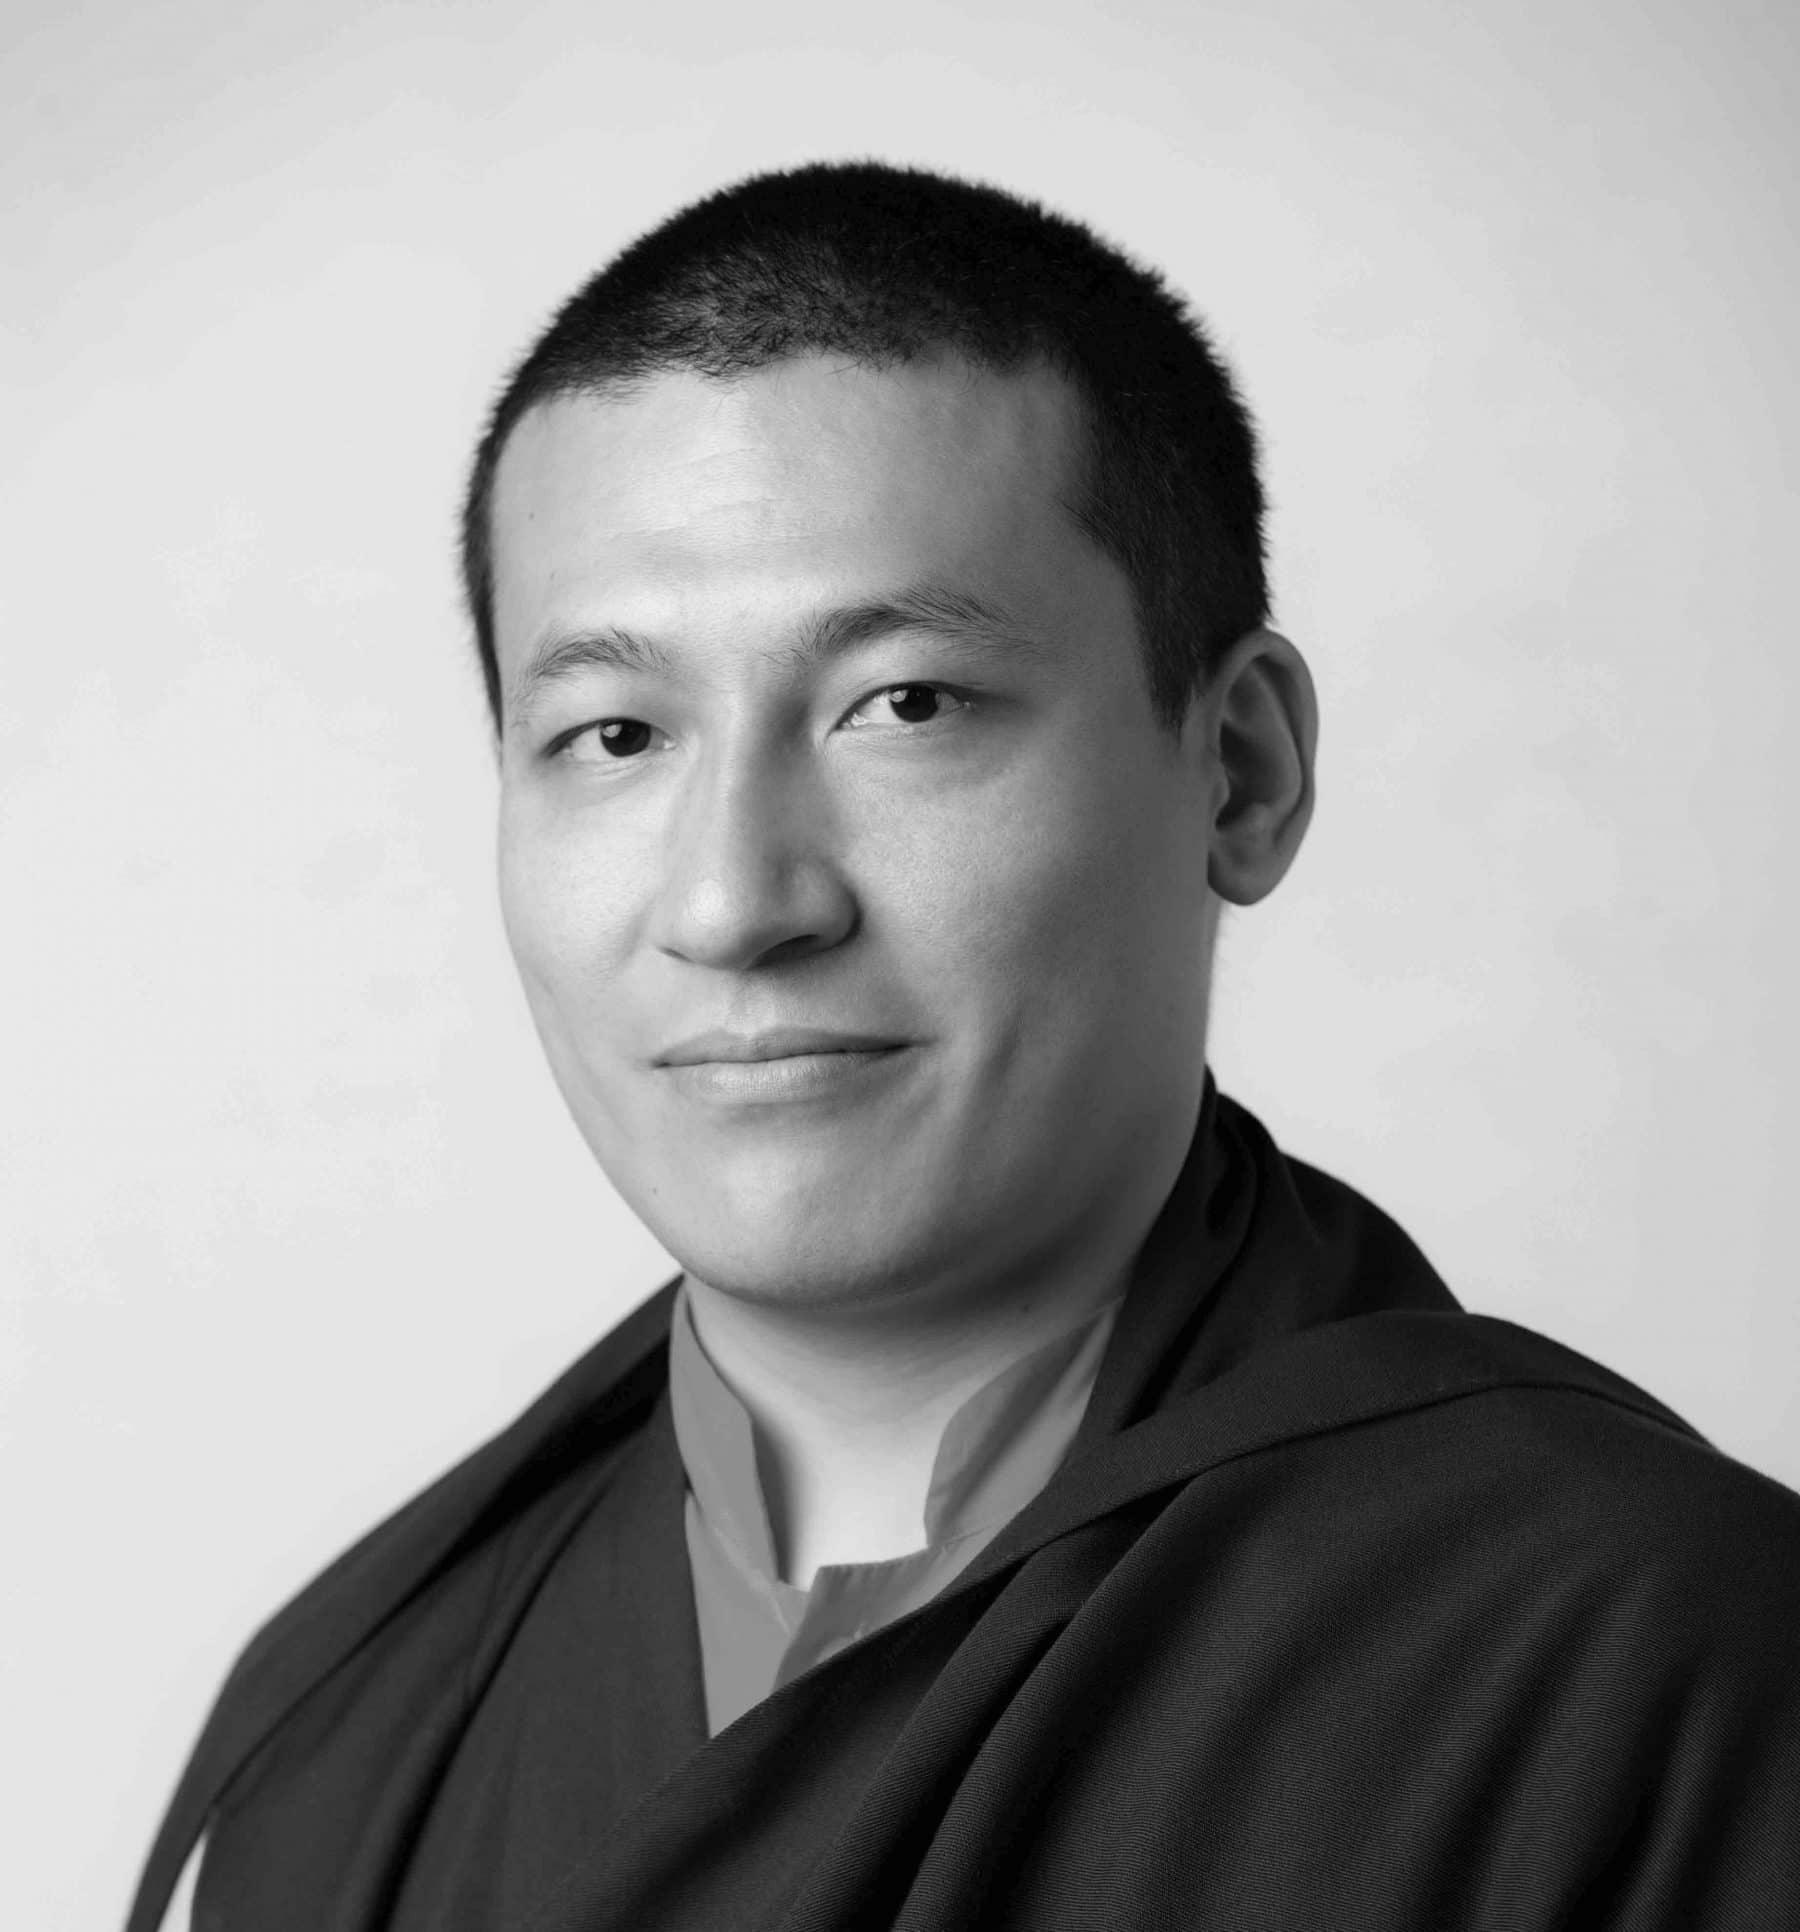 Thayé Dorjé, Sa Sainteté le 17ème Karmapa